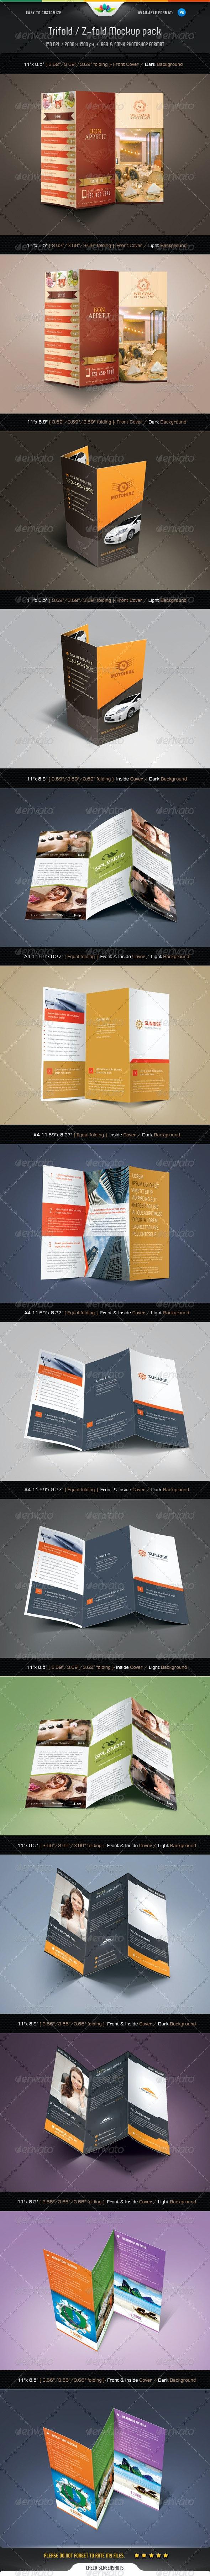 Trifold & Z-fold Mock-Up Pack - Brochures Print